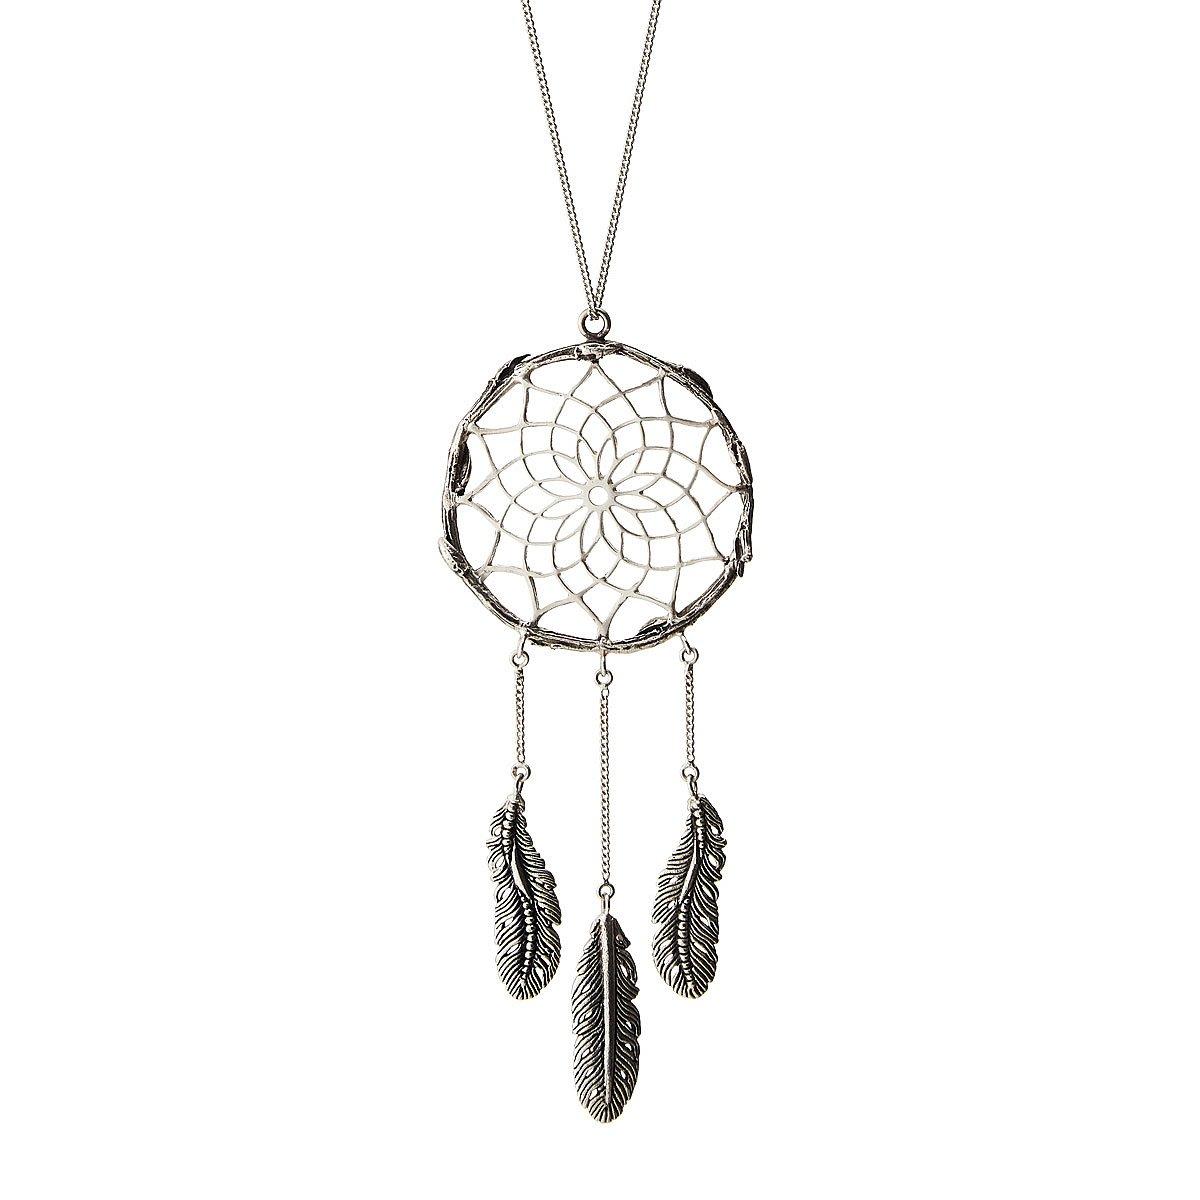 Silver dreamcatcher pendant handmade silver necklace uncommongoods silver dreamcatcher pendant 1 thumbnail mozeypictures Choice Image